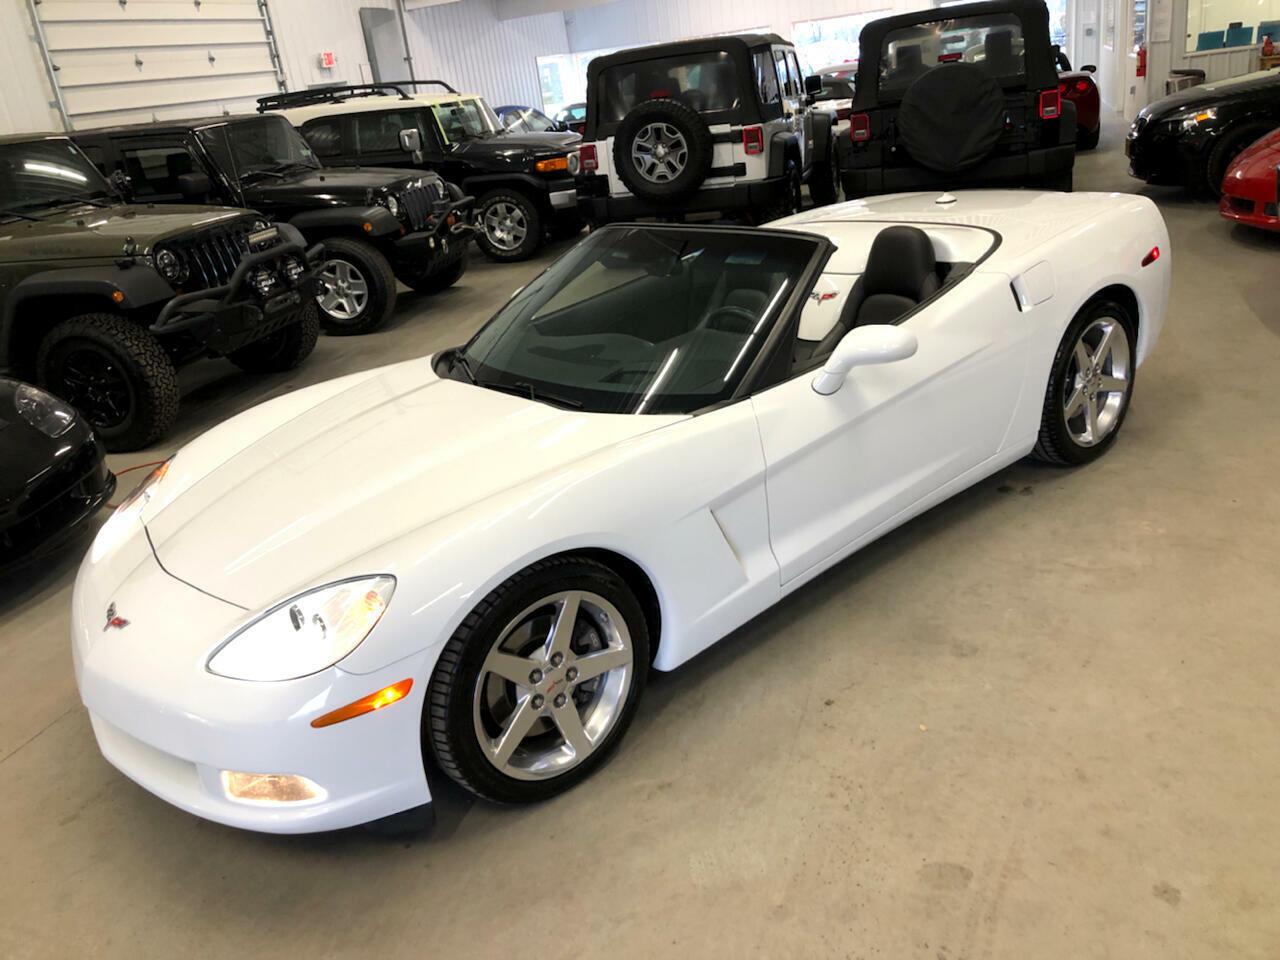 2005 White Chevrolet Corvette Convertible  | C6 Corvette Photo 1